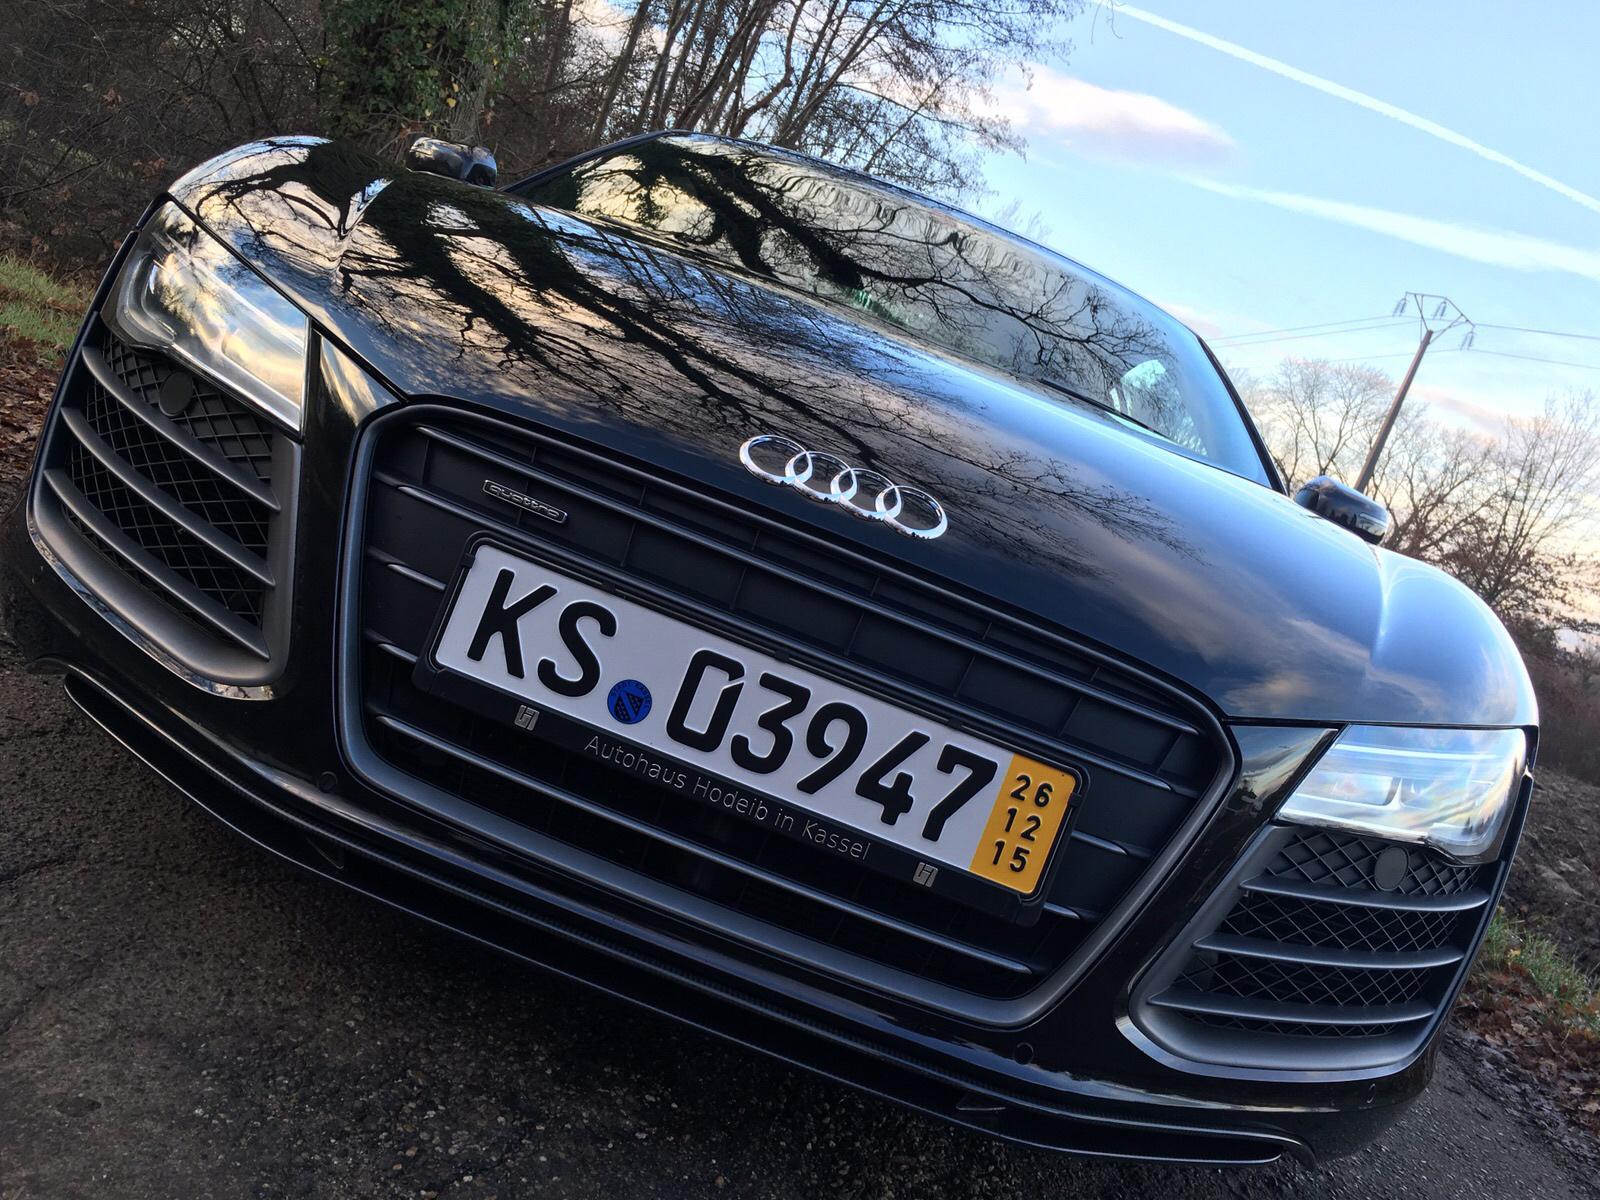 Audi R8 V10 5.2 FSI 549CV